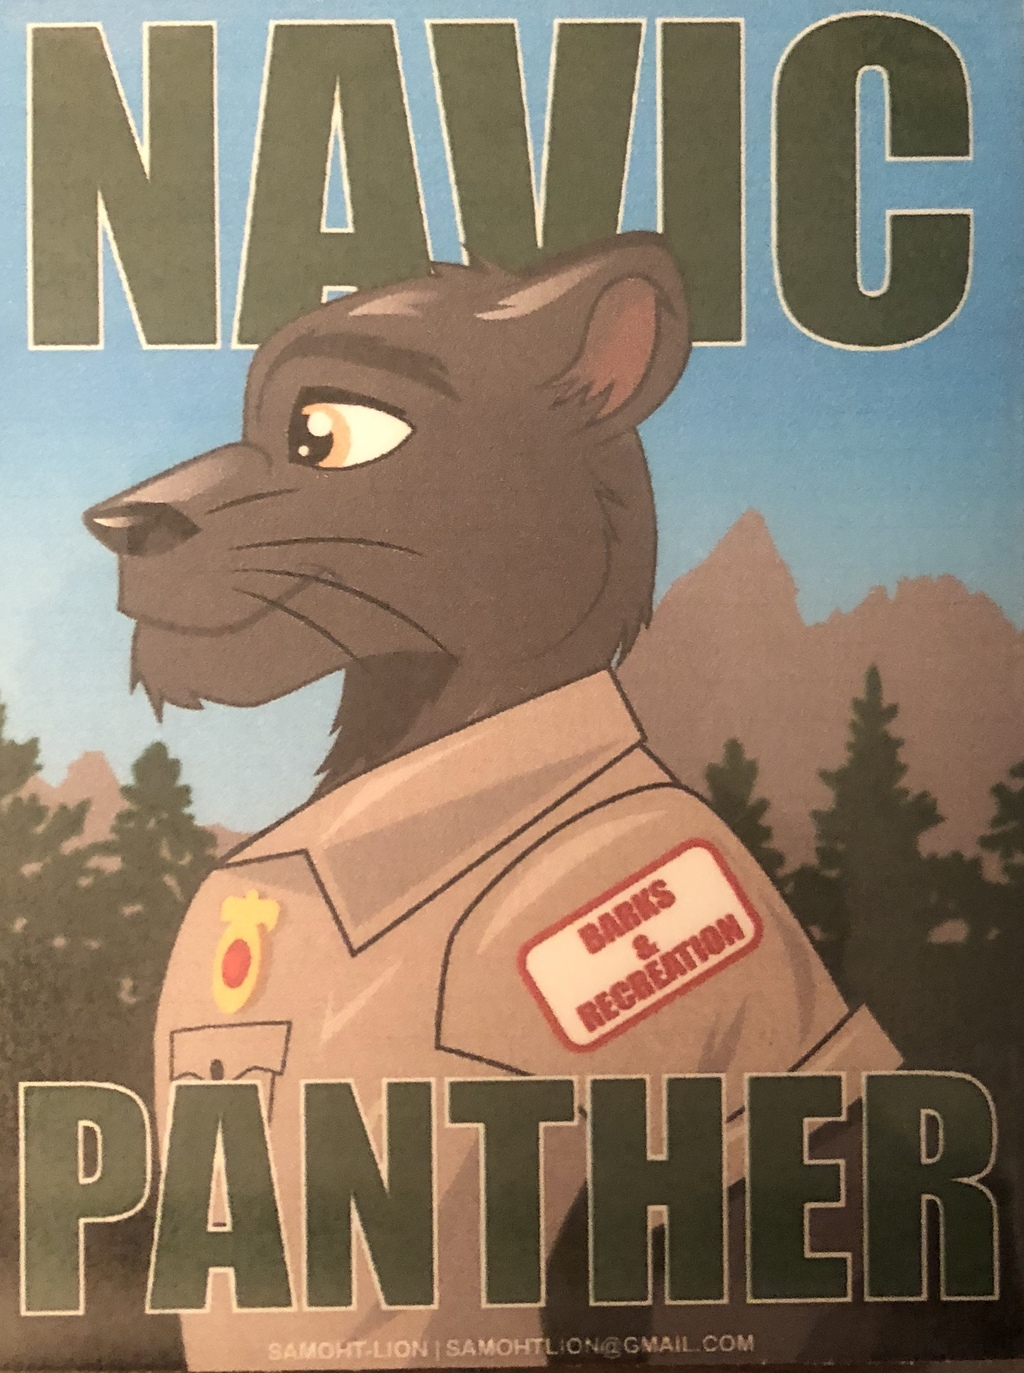 Most recent image: Navic Badge by Samoht Lion